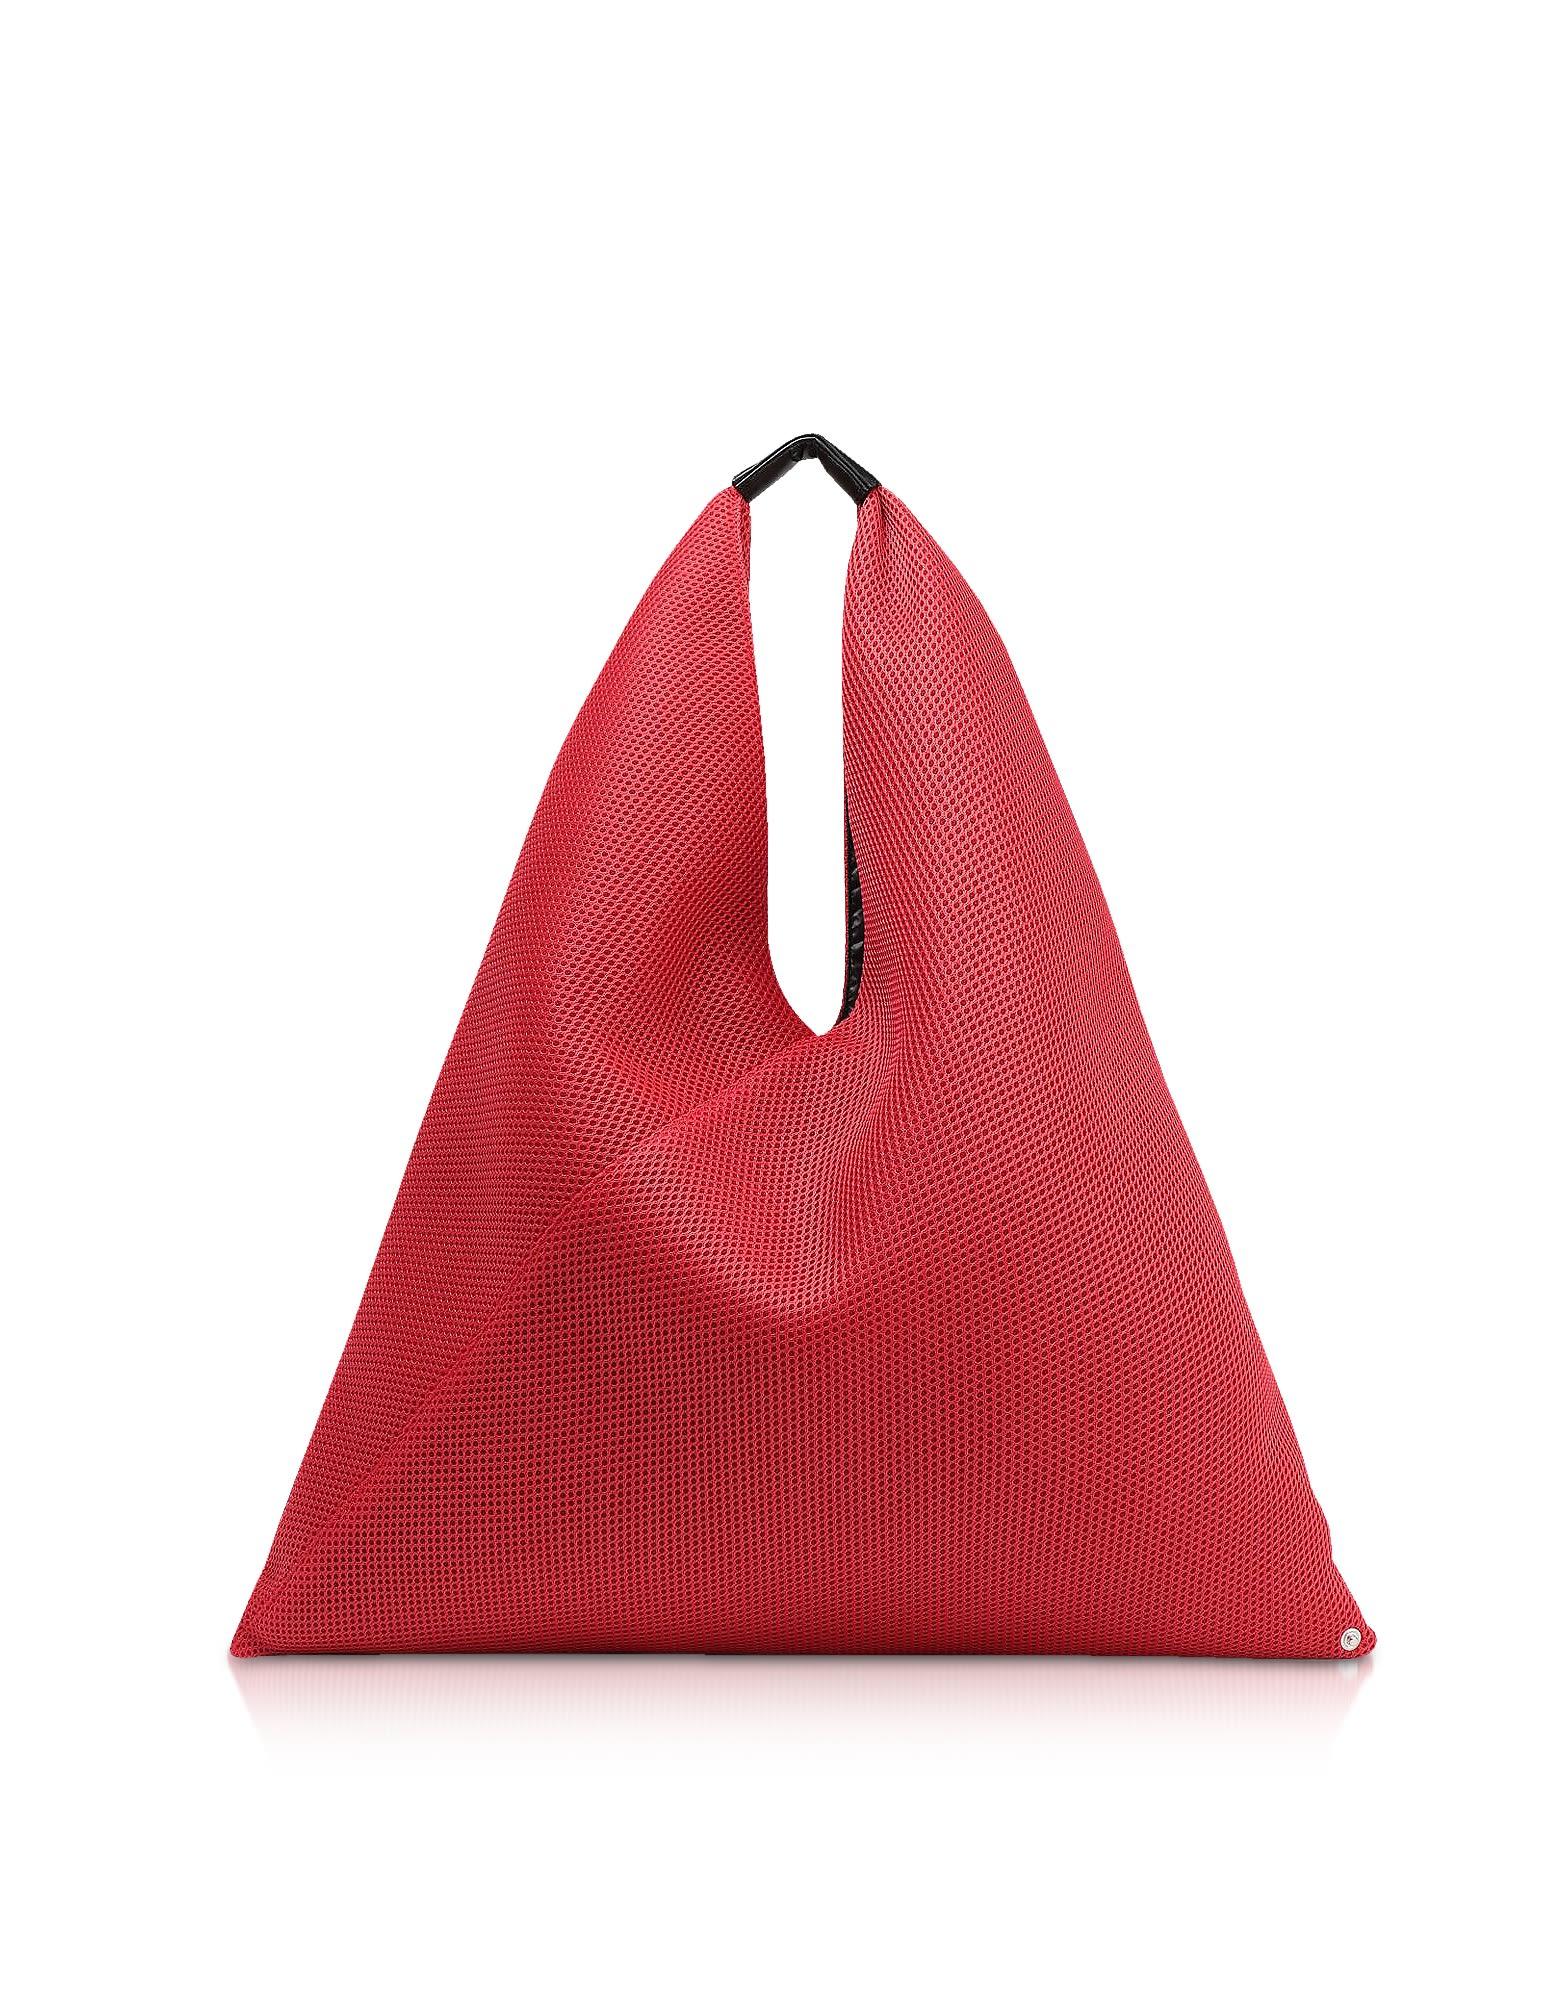 9a75c0e79e48 Mm6 Maison Margiela Mm6 Maison Martin Margiela Net Fabric Japanese Tote Bag  In Red